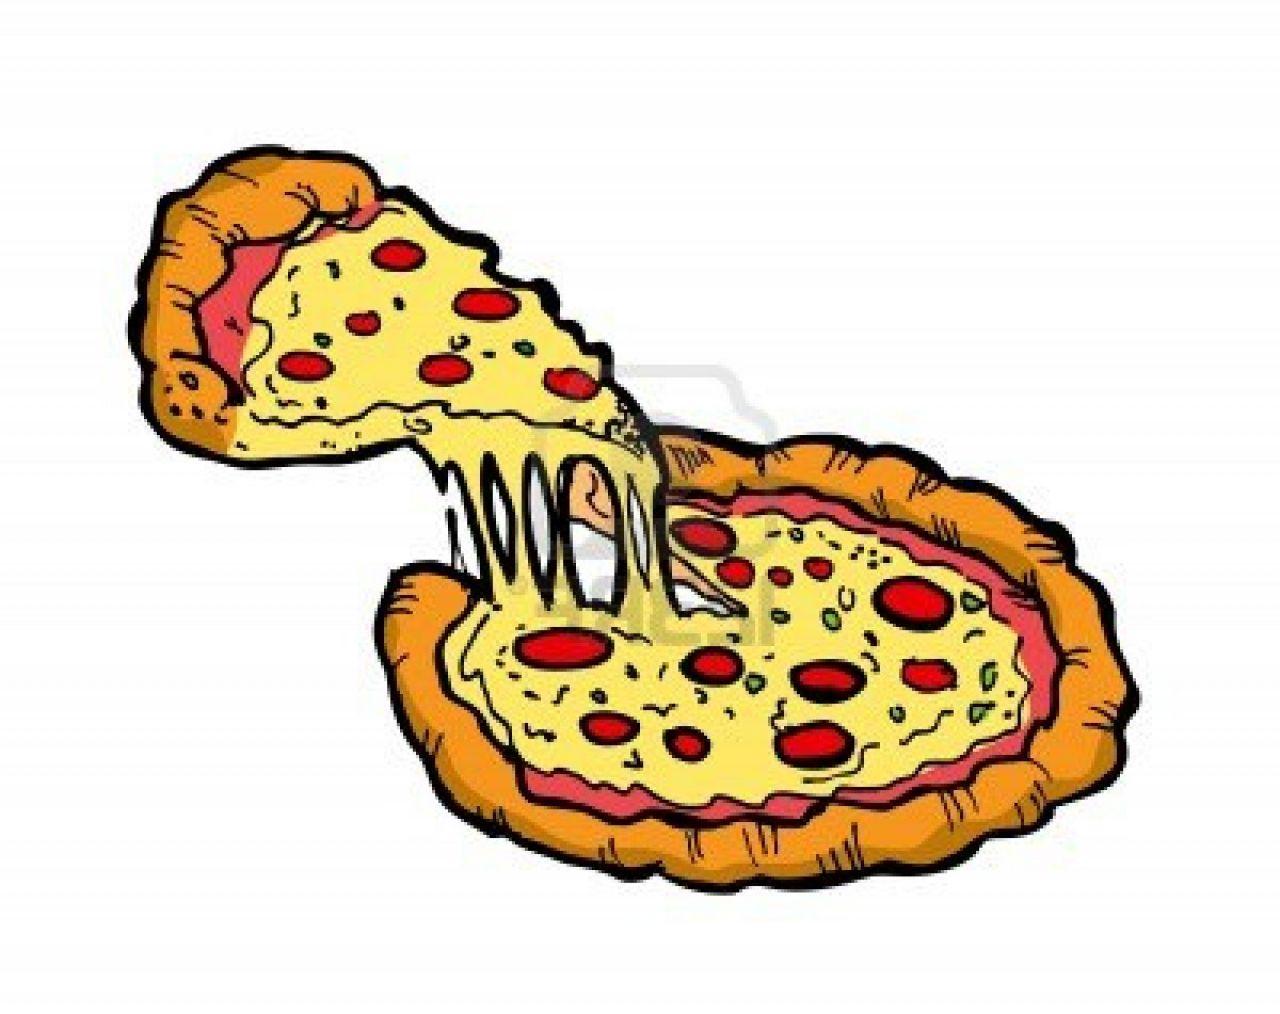 1280x1014 Pizza Clip Art Free Download Clipart Images 7